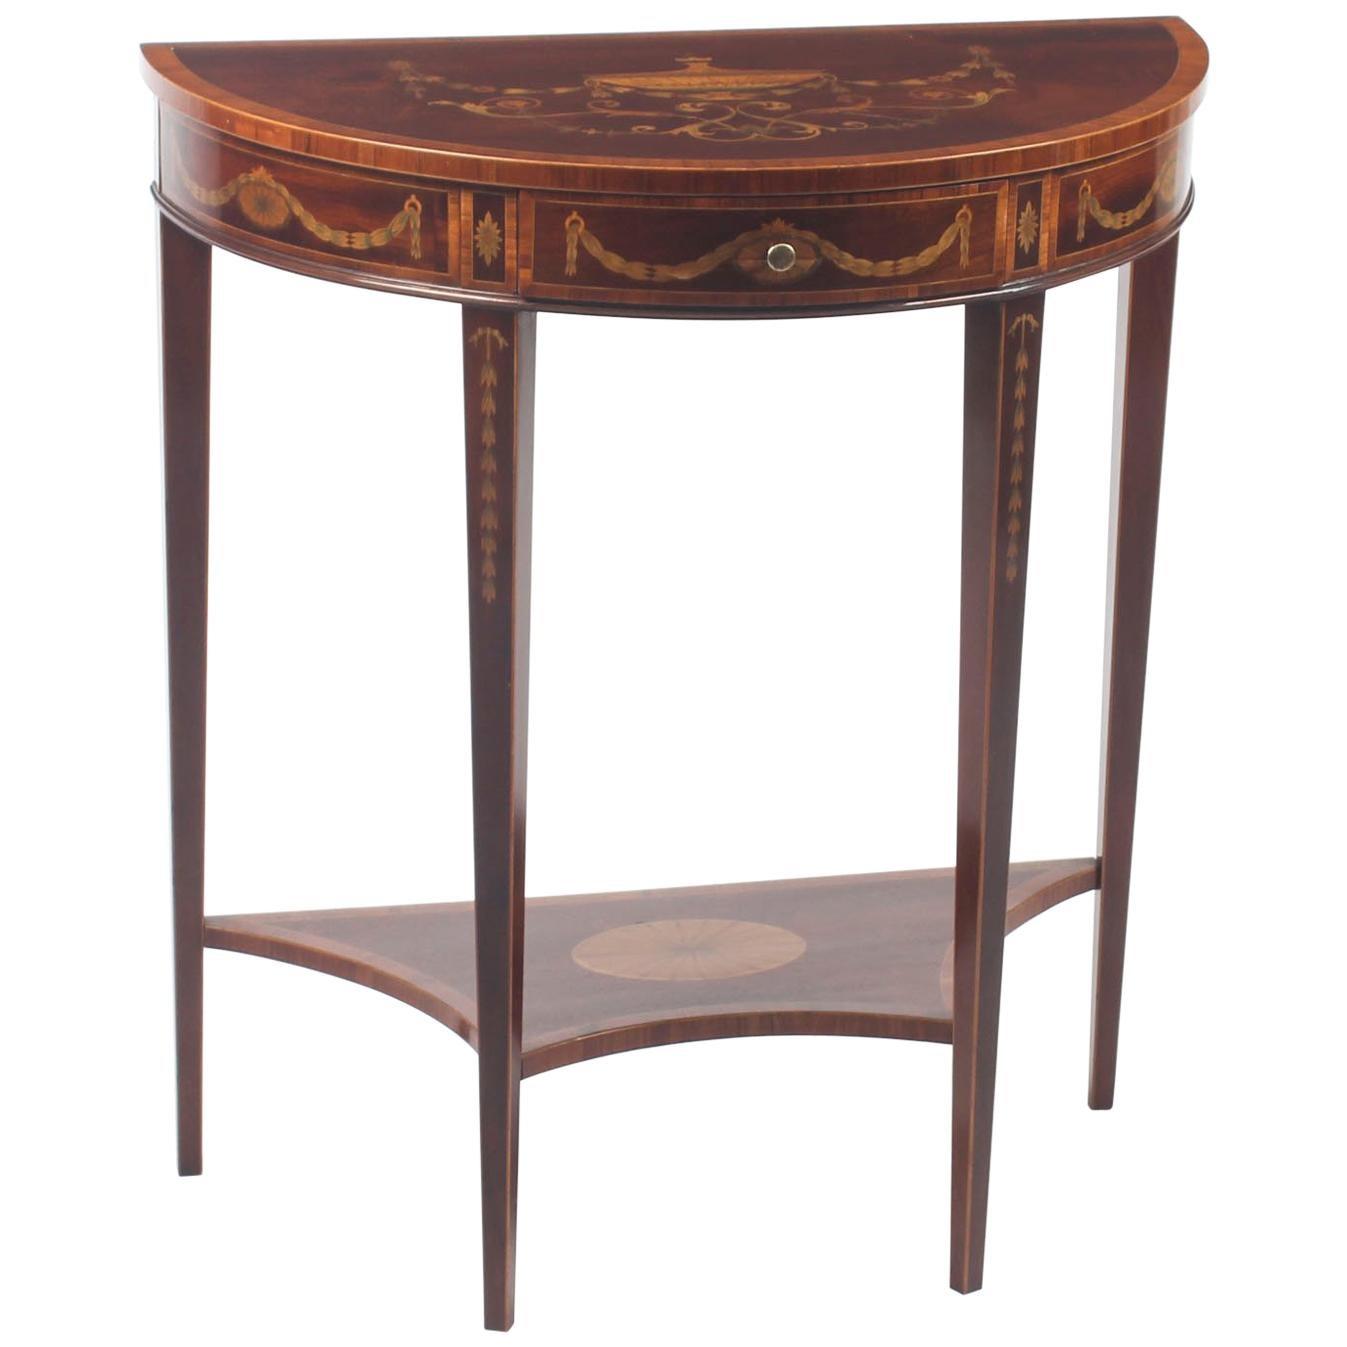 Antique Console Tables 19th Century